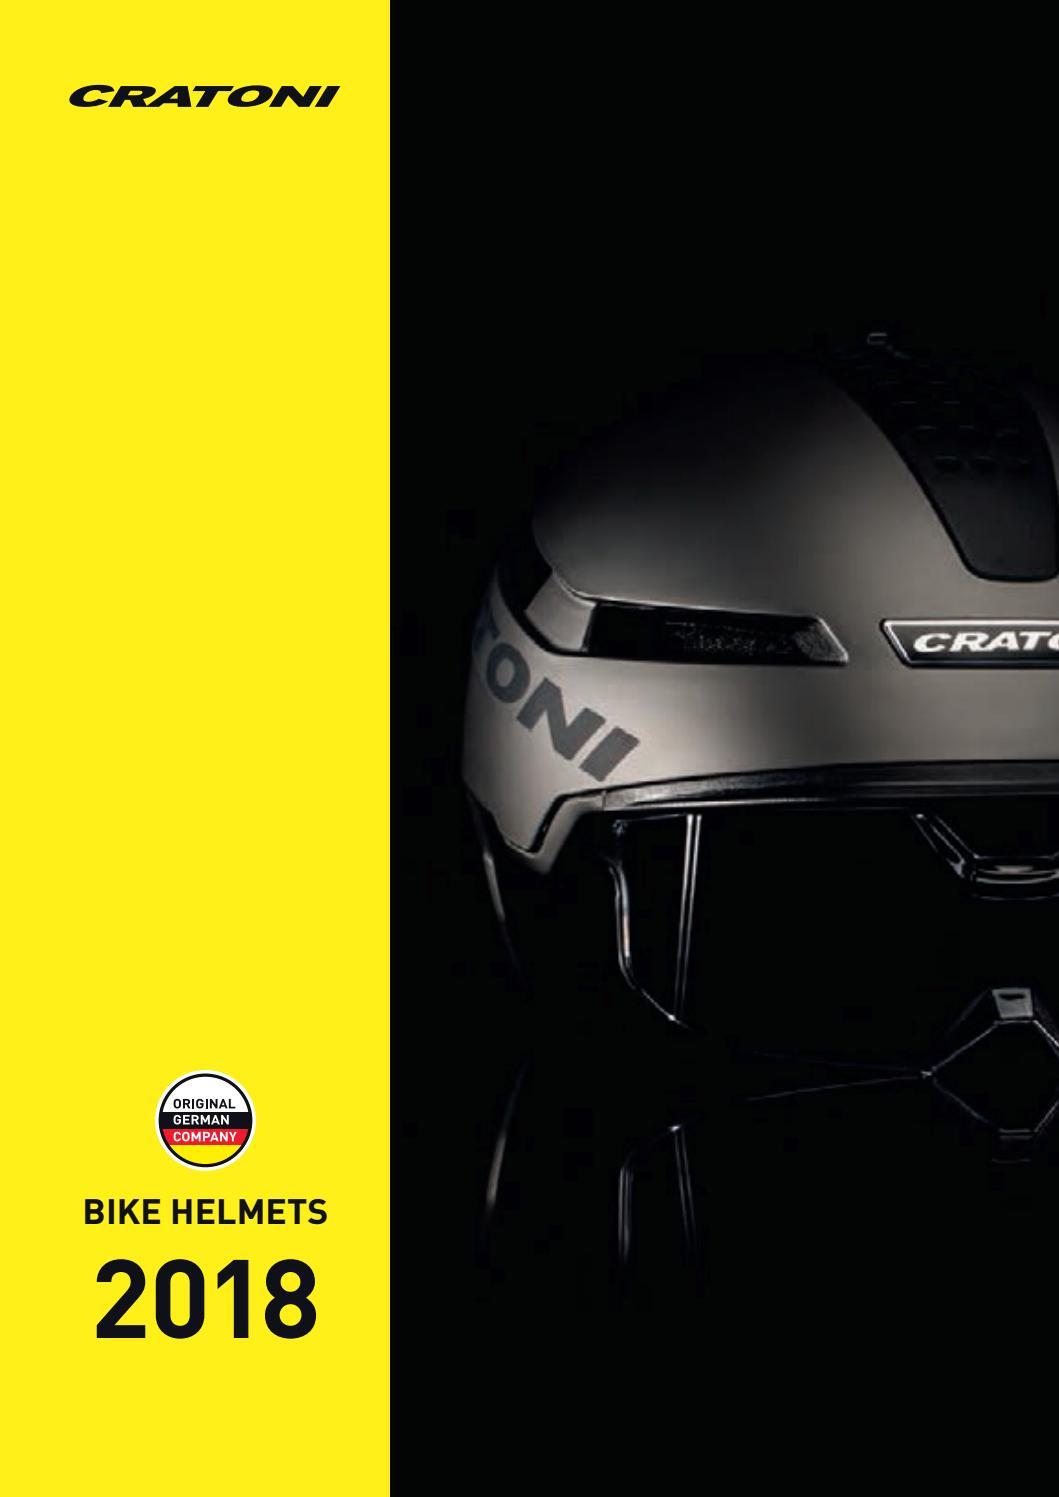 für Commuter//Evo//C-Loom ab 2018 1 S Typ G CRATONI 130301D5 Helm-Rücklicht sz